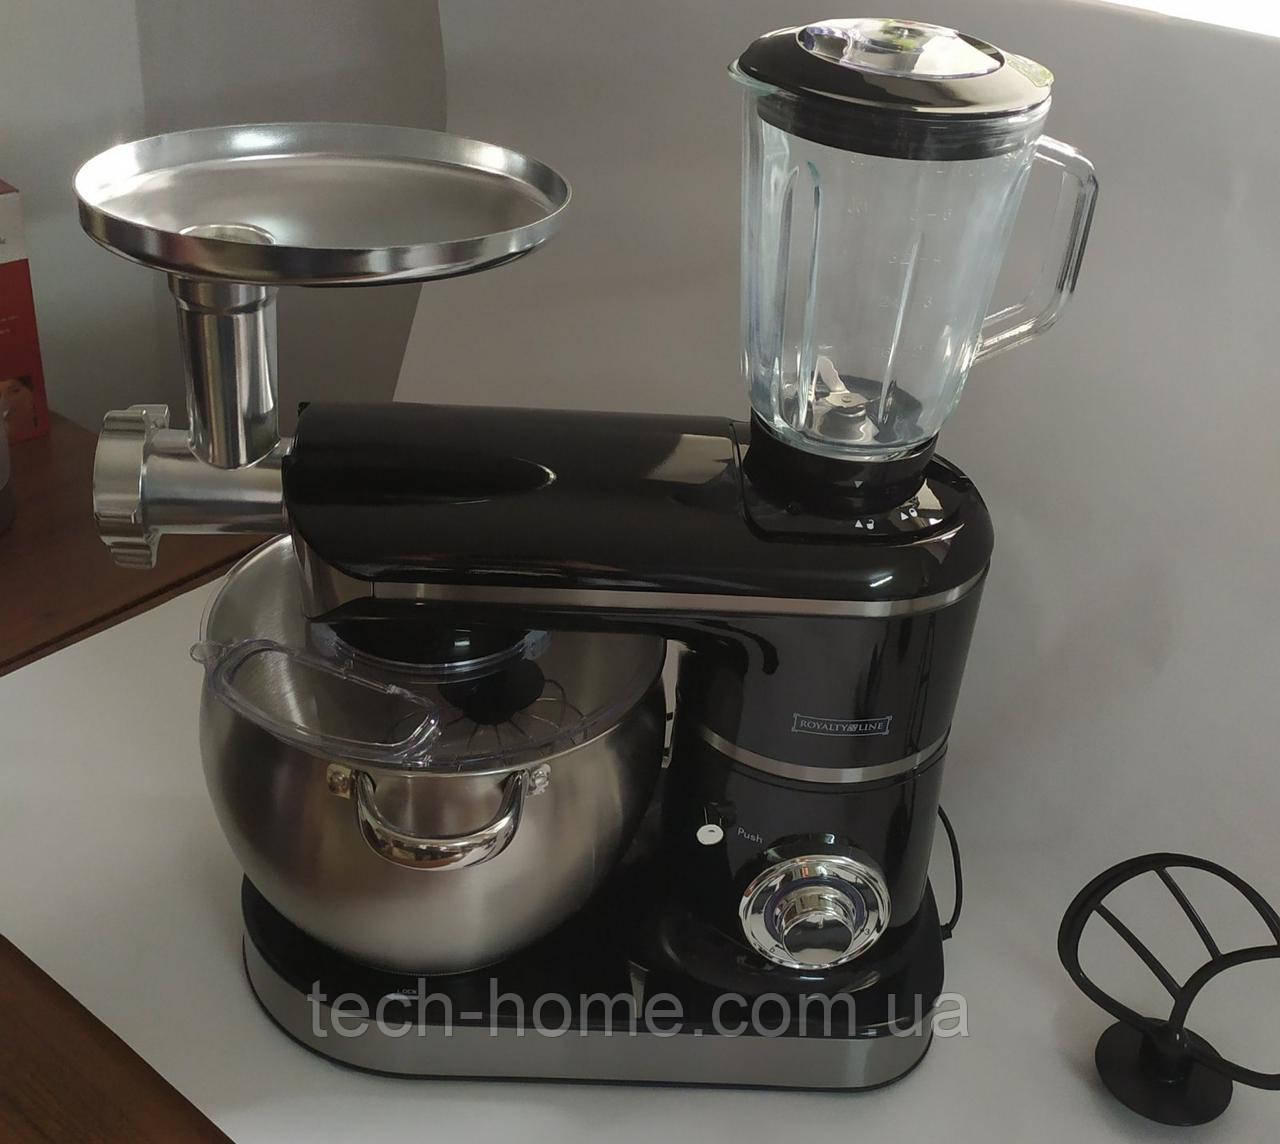 Кухонный комбайн тестомес Royalty Line RL-PKM 2200.472.9 BG   2200 Вт  BLACK